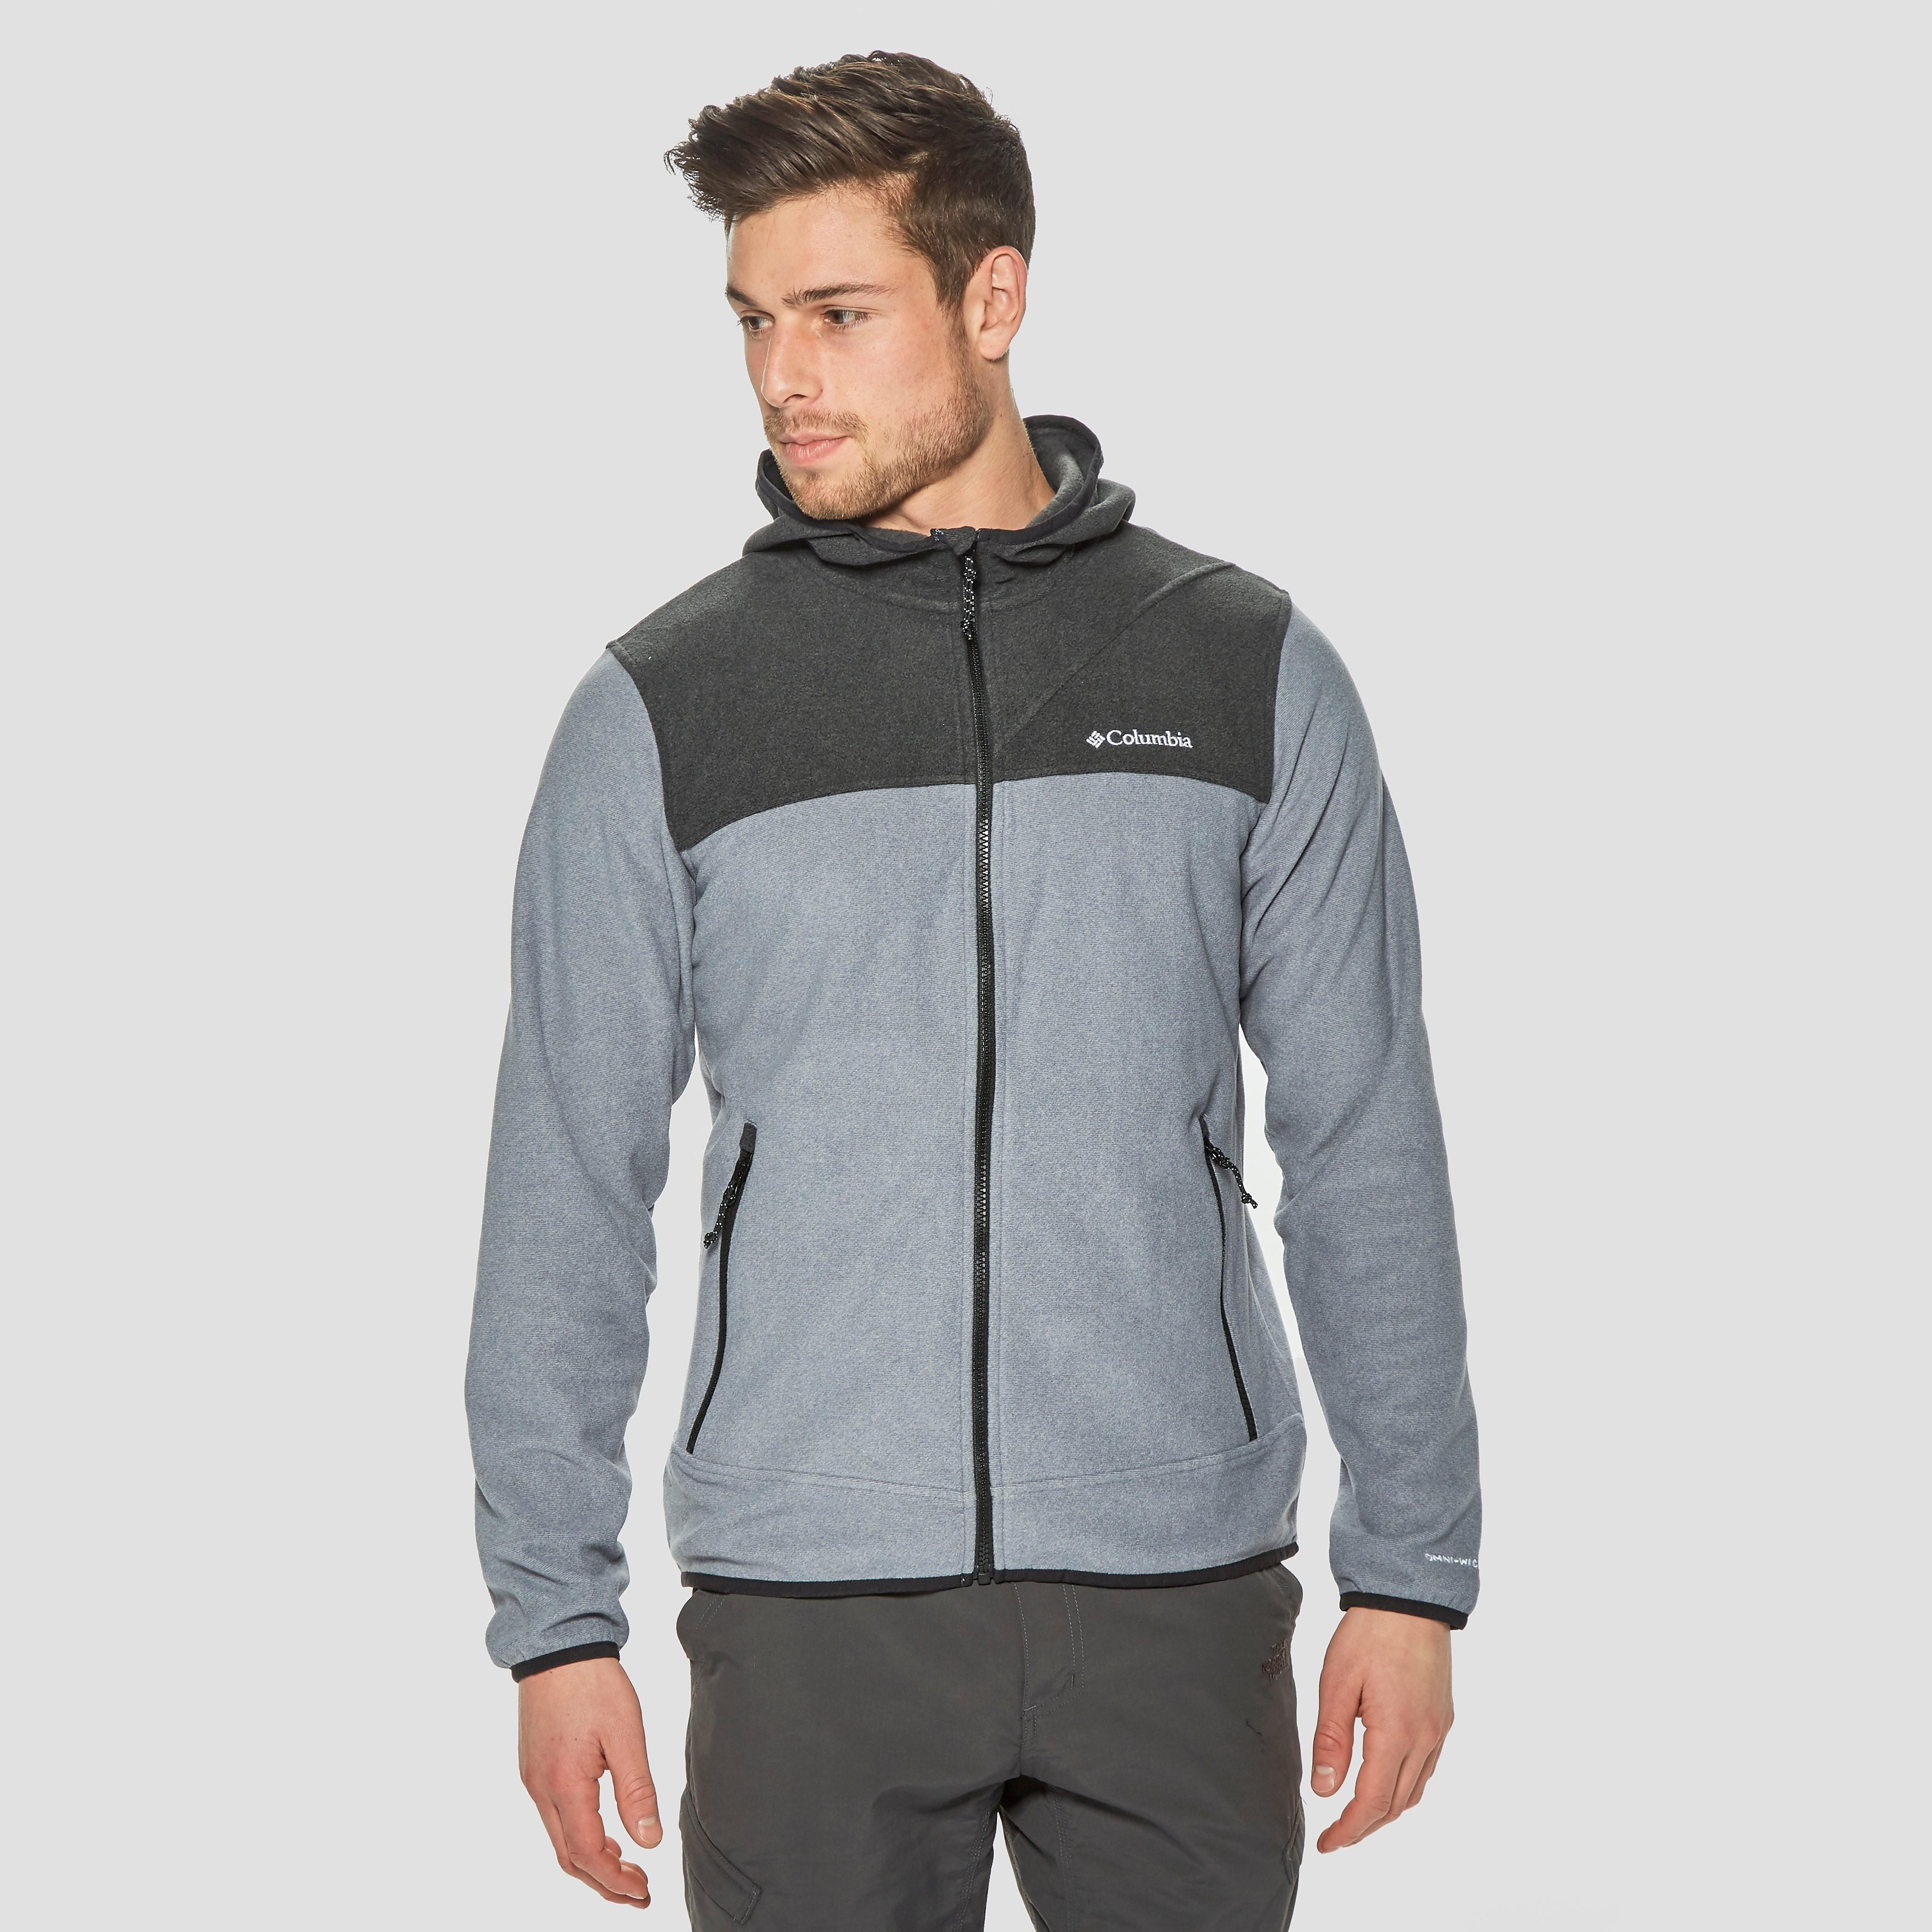 Columbia Pine Mountain Men's Fleece Jacket